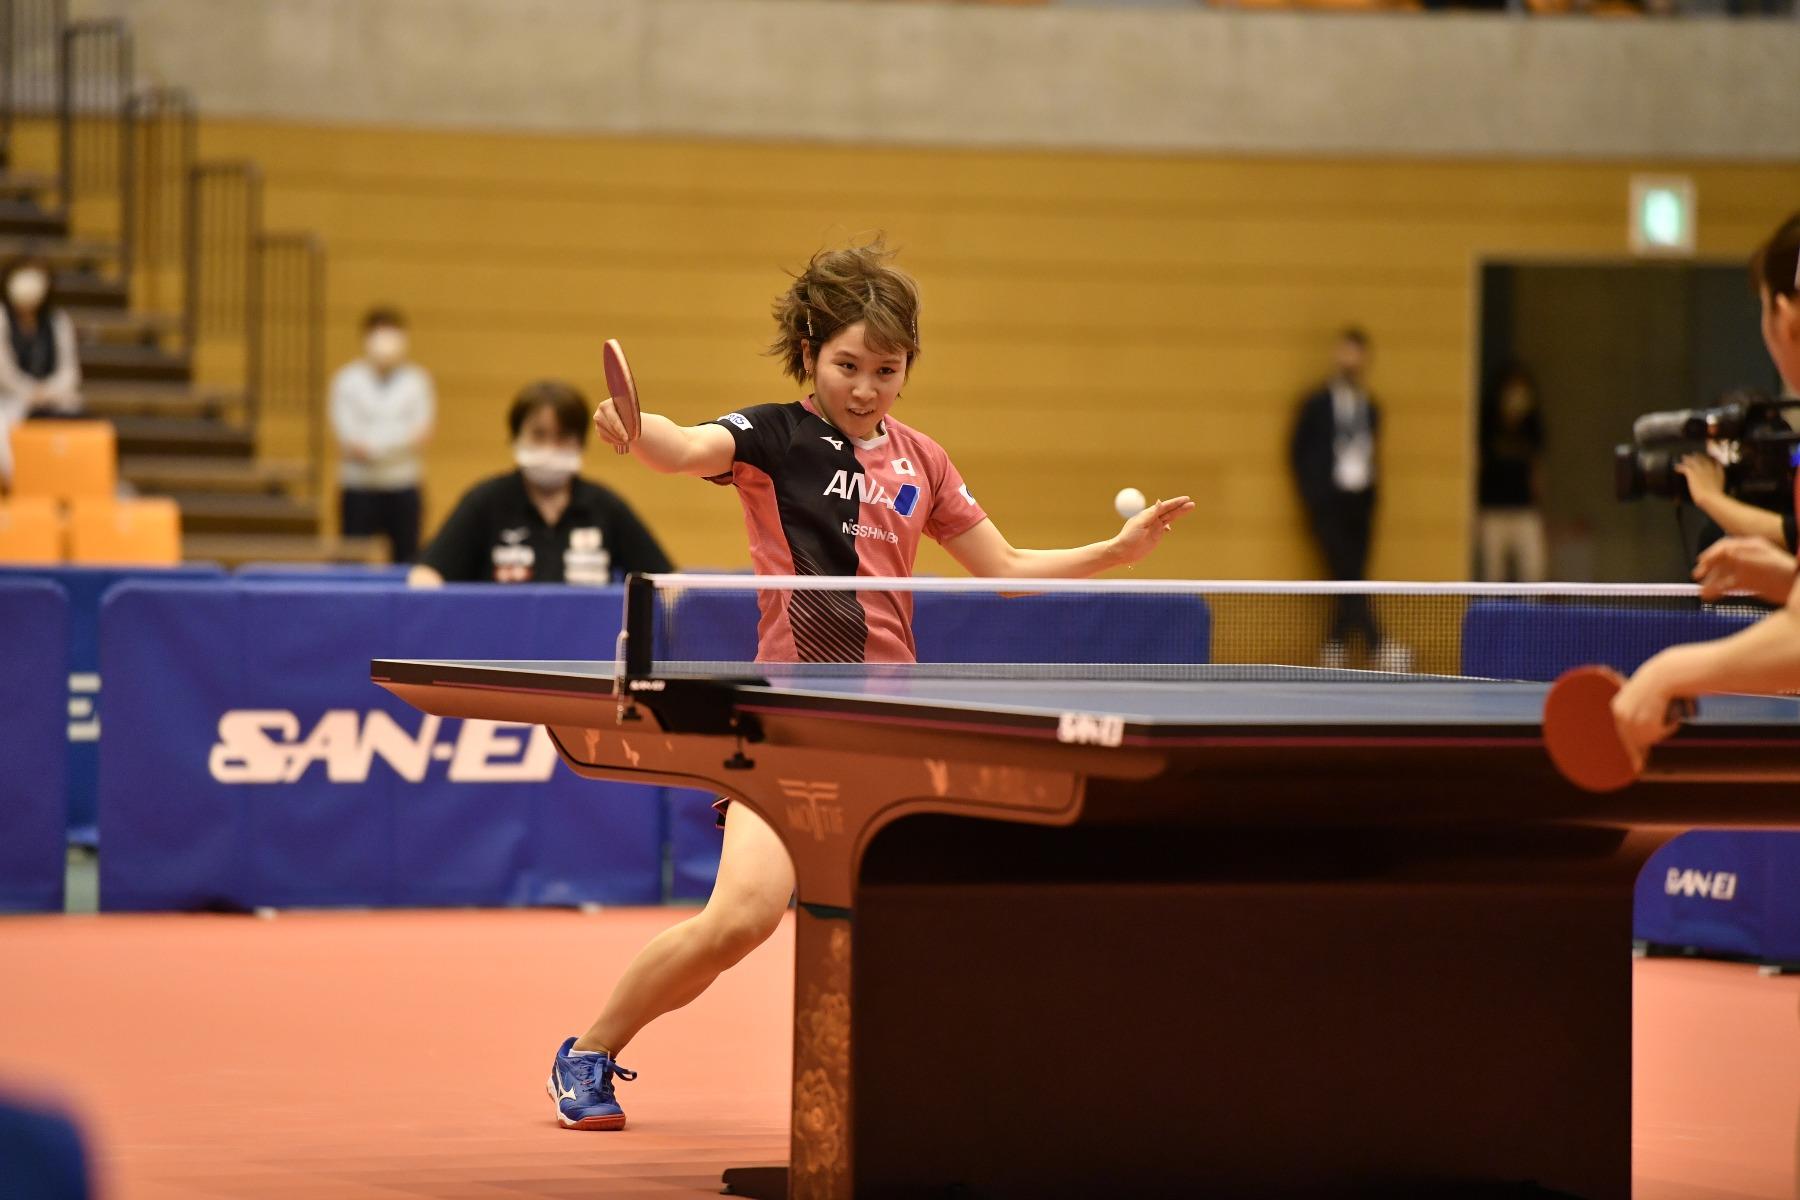 VICTAS ヴィクタス VICTAS PLAY ヴィクタスプレイ 卓球 VICTAS JOURNAL 東京五輪壮行試合、2021卓球NIPPONドリームマッチ女子は、日本代表が5-0の快勝。